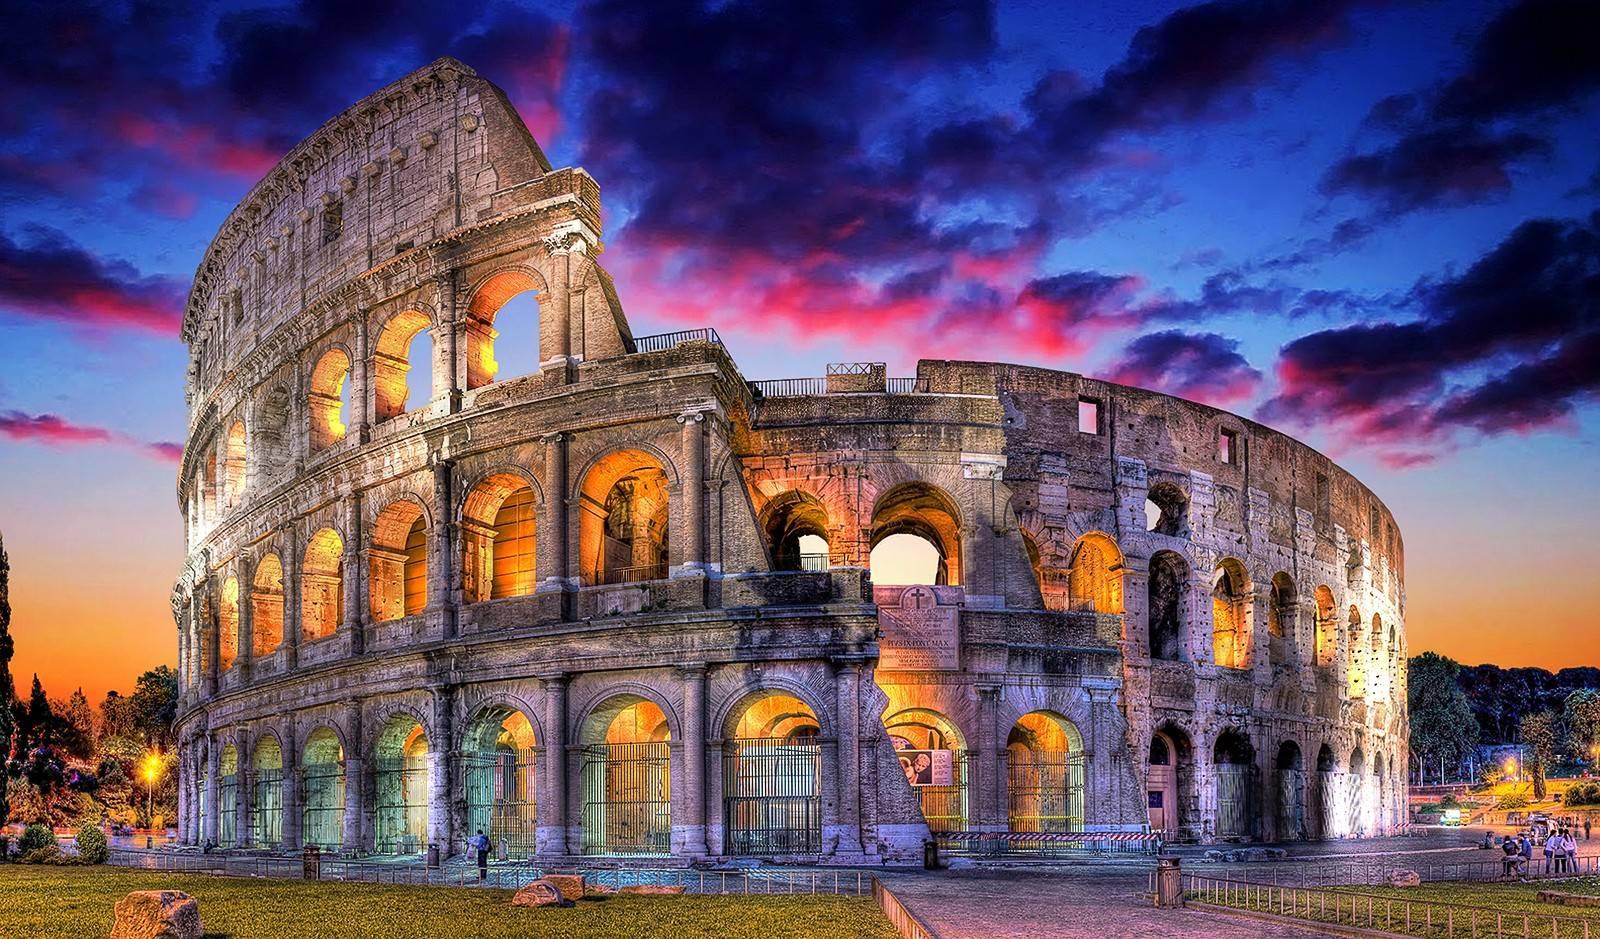 Coliseum.